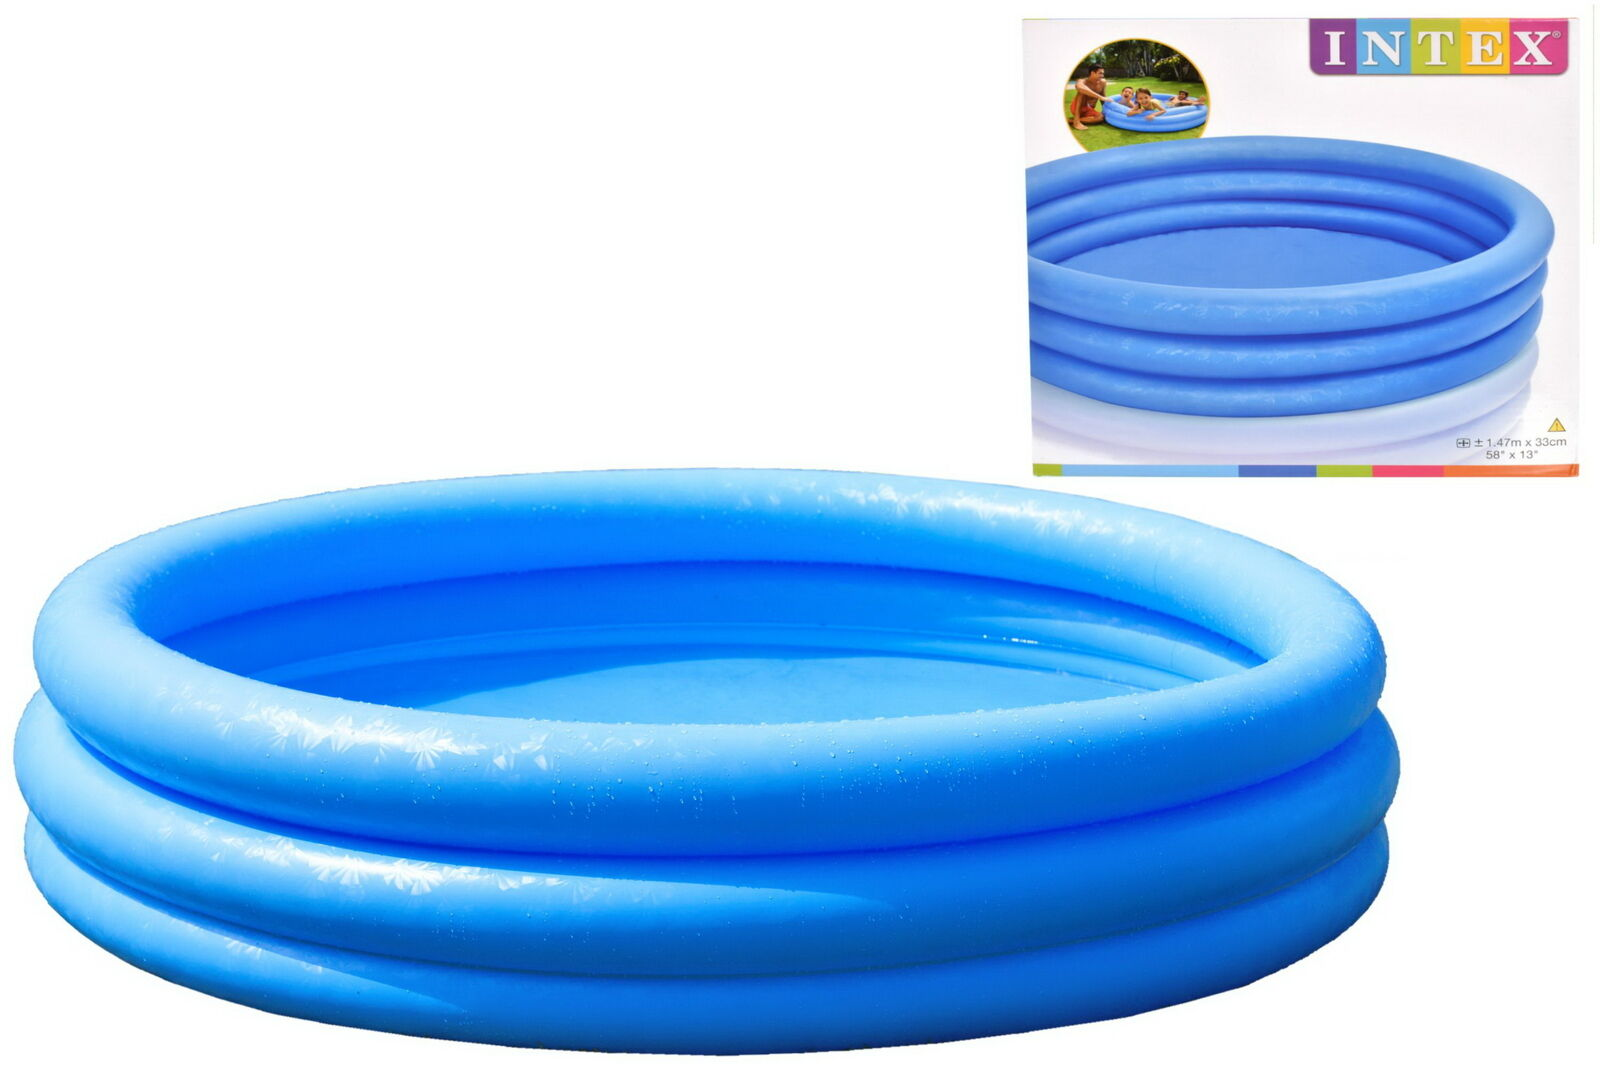 Intex Inflable Tres Anillo Cristal blue Jardín Piscina Infantil